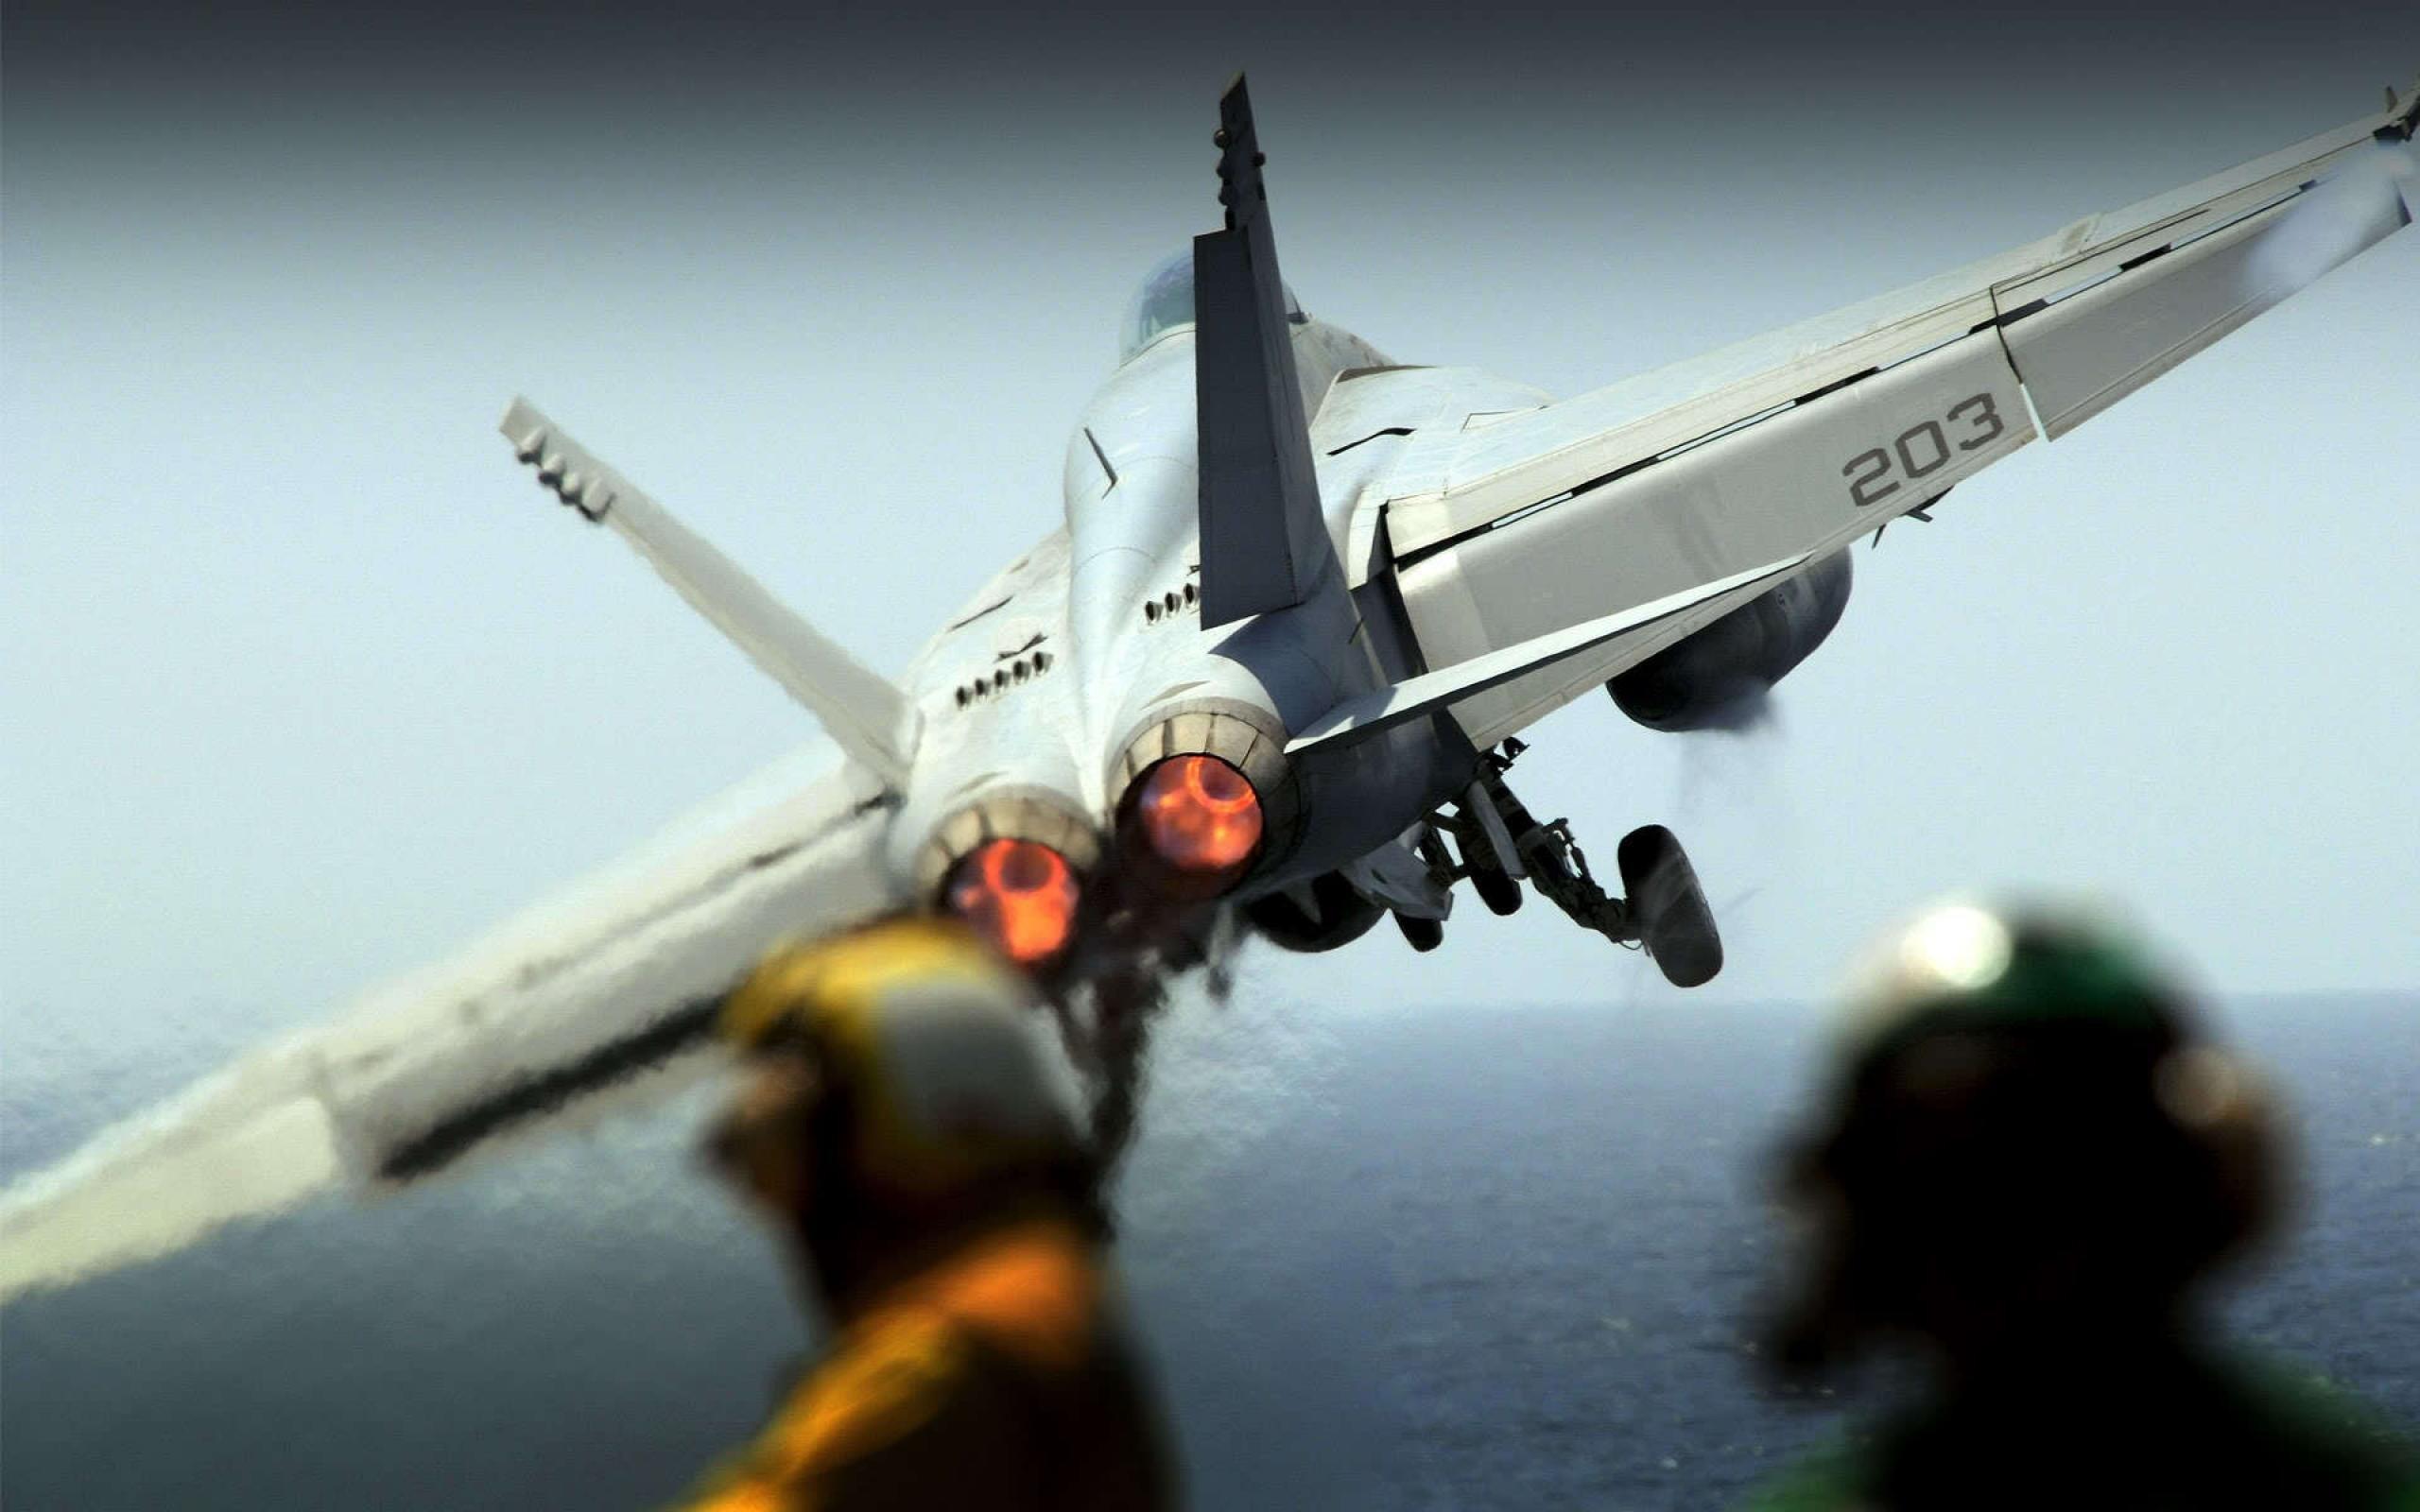 F 18 Super Hornet Wallpapers 77 Images